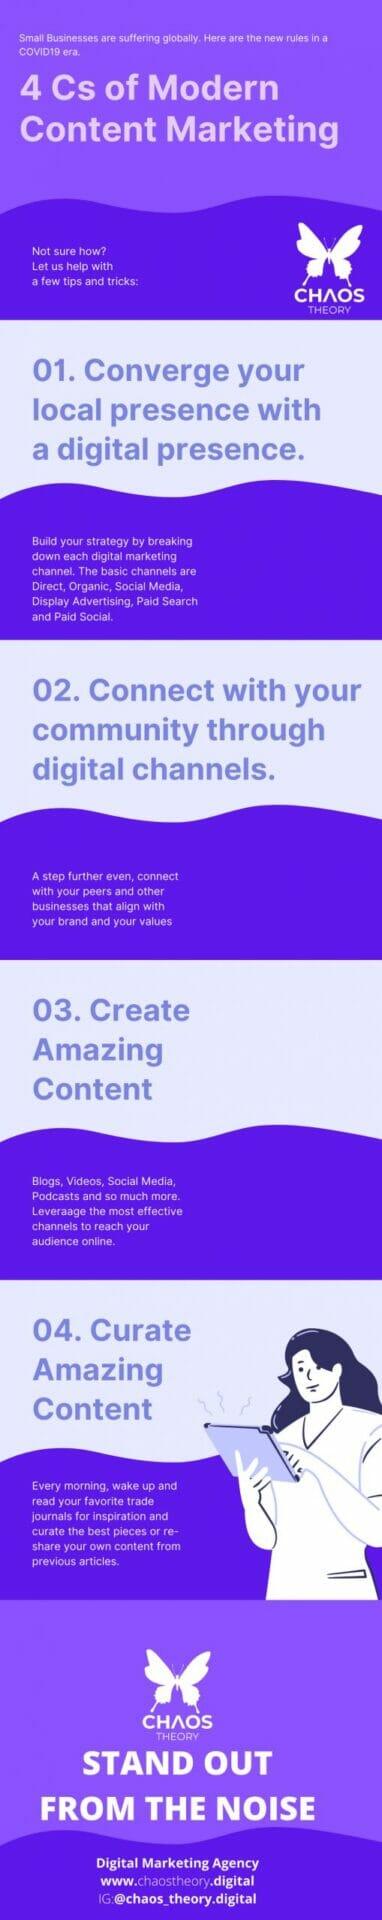 4cs of Marketing Infographic